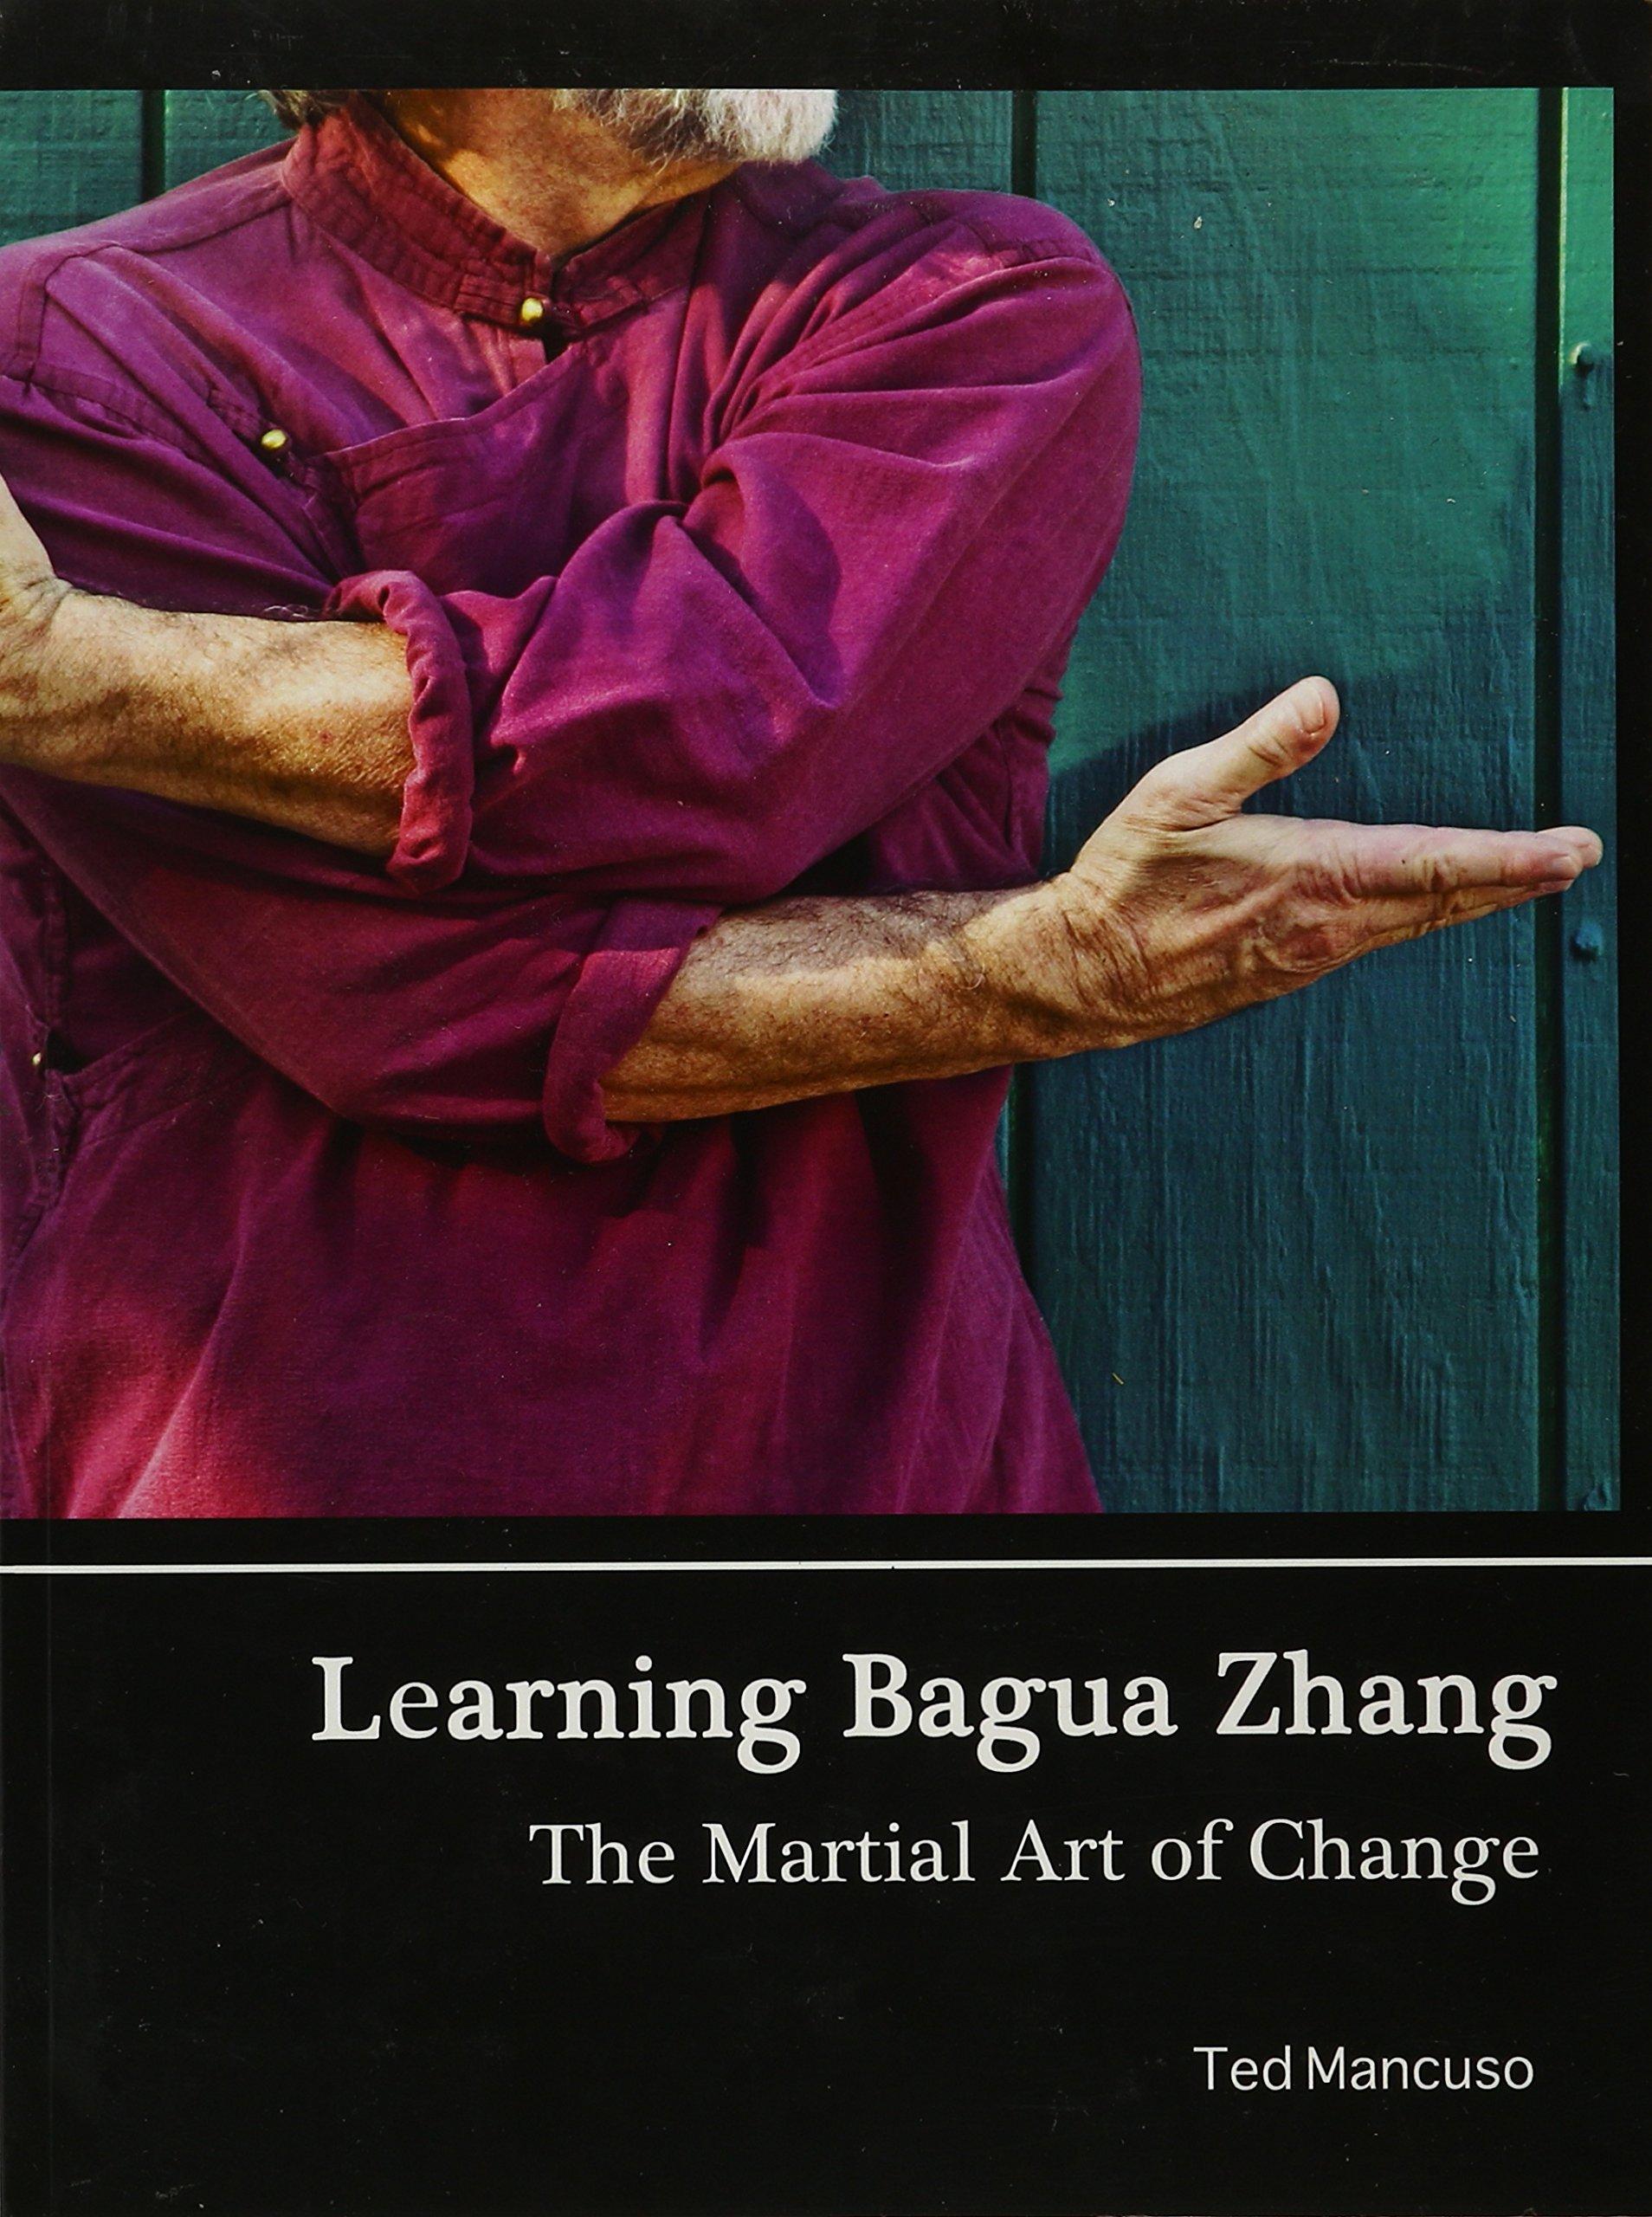 Learning Bagua Zhang The Martial Art of Change PDF